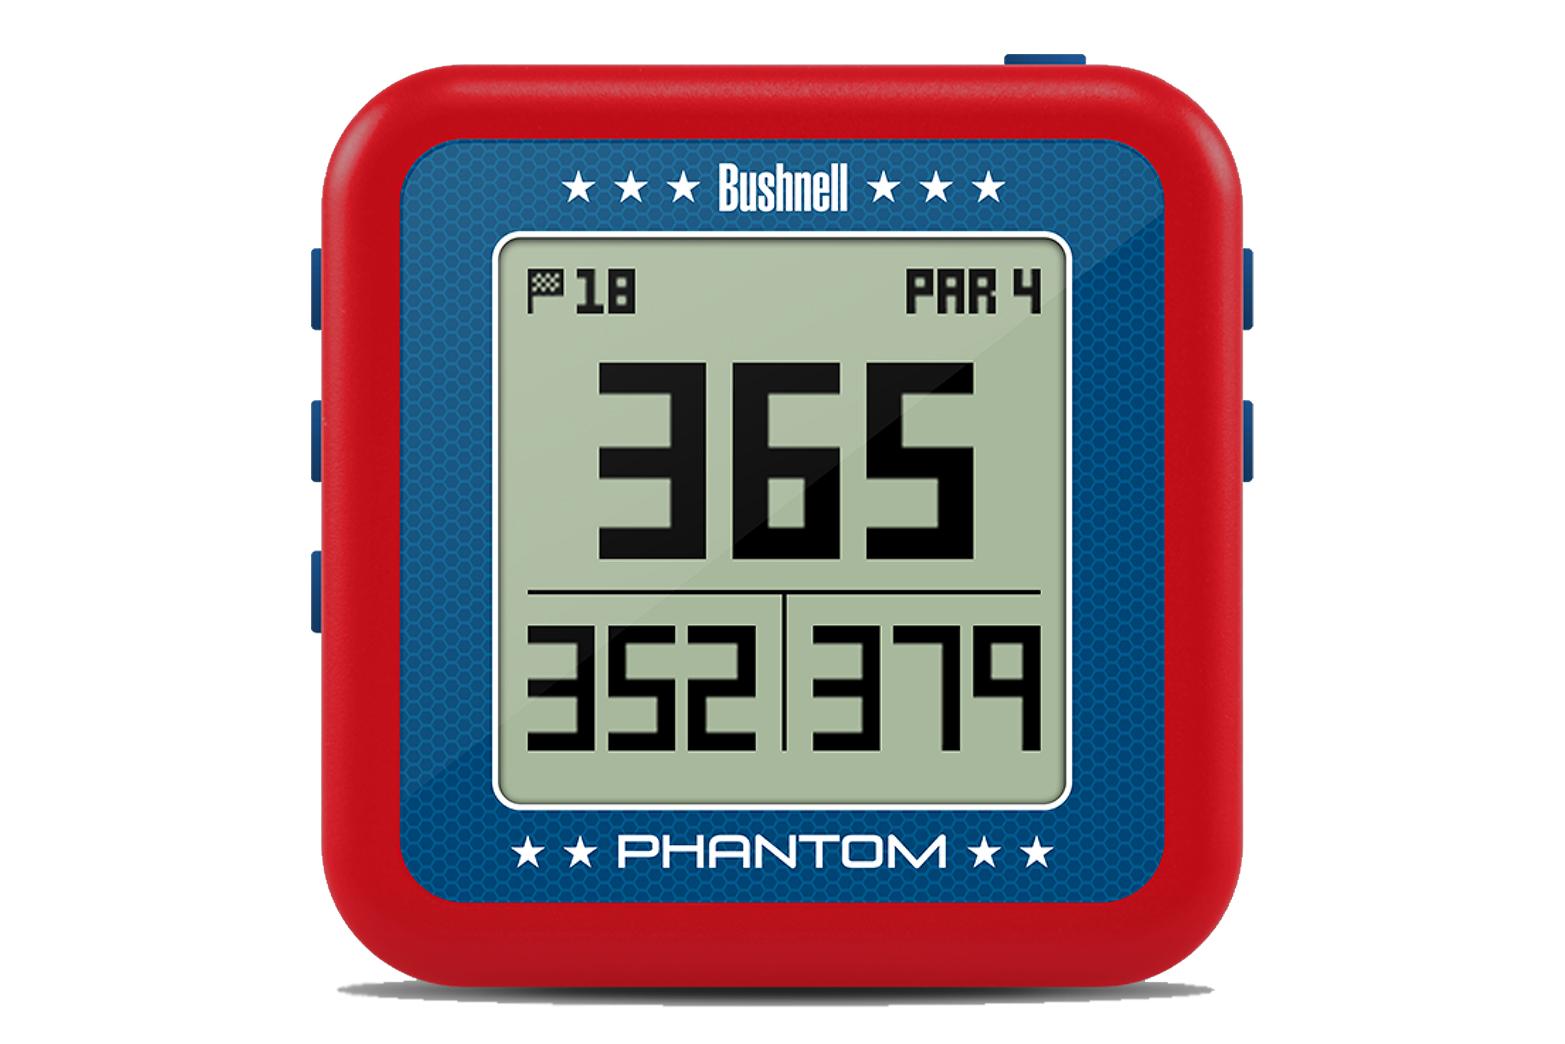 Bushnell launch new Phantom GPS rangefinder